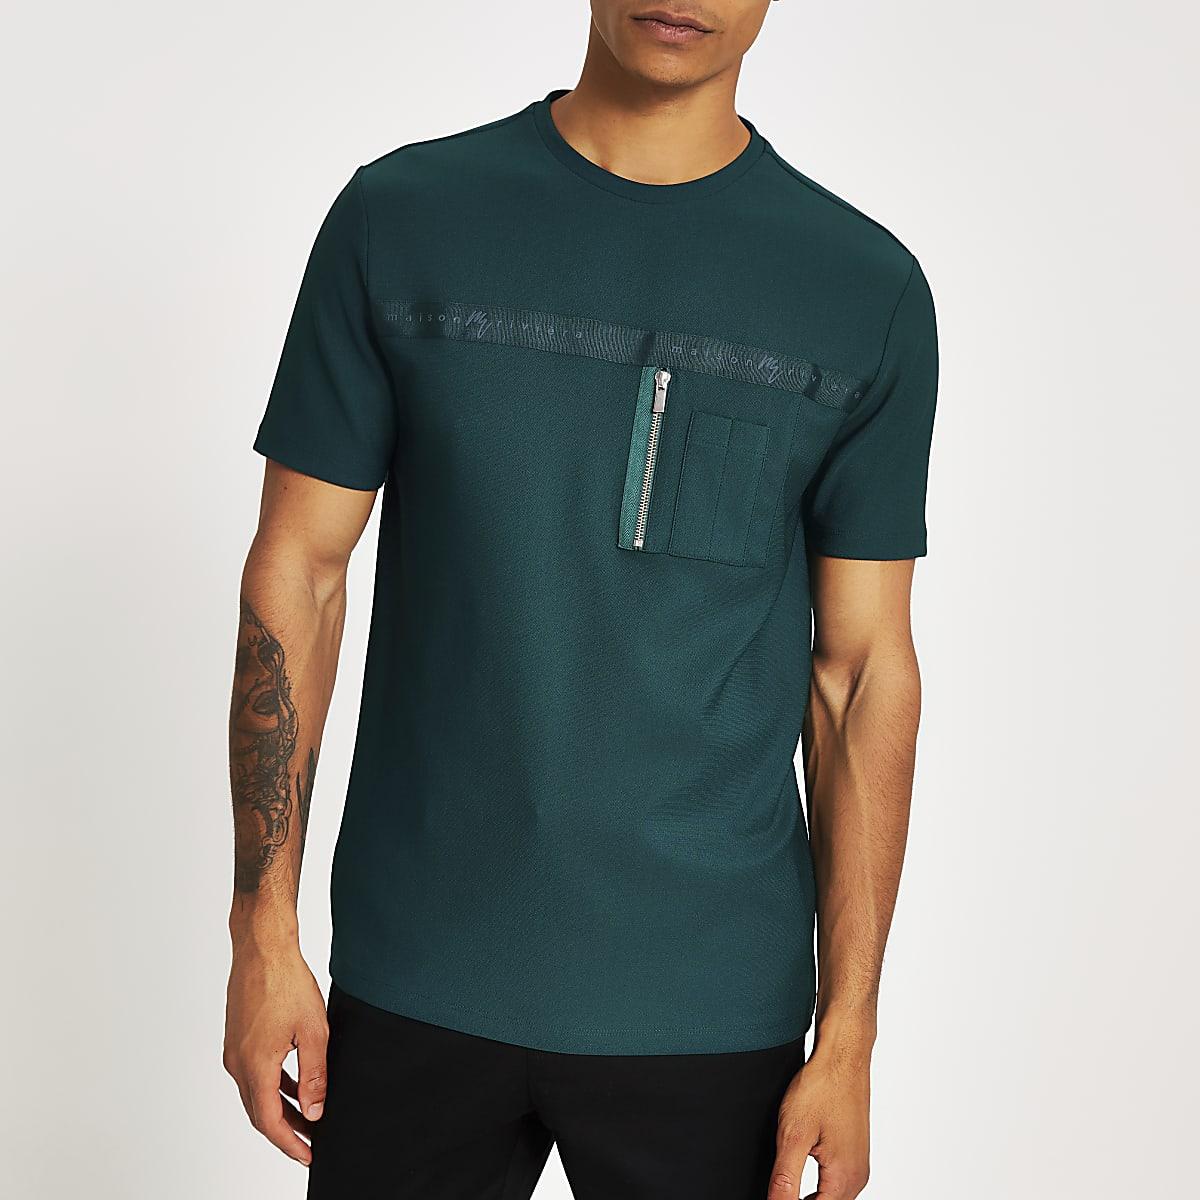 Maison Rivera – T-shirt utilitaire coupe slim vert